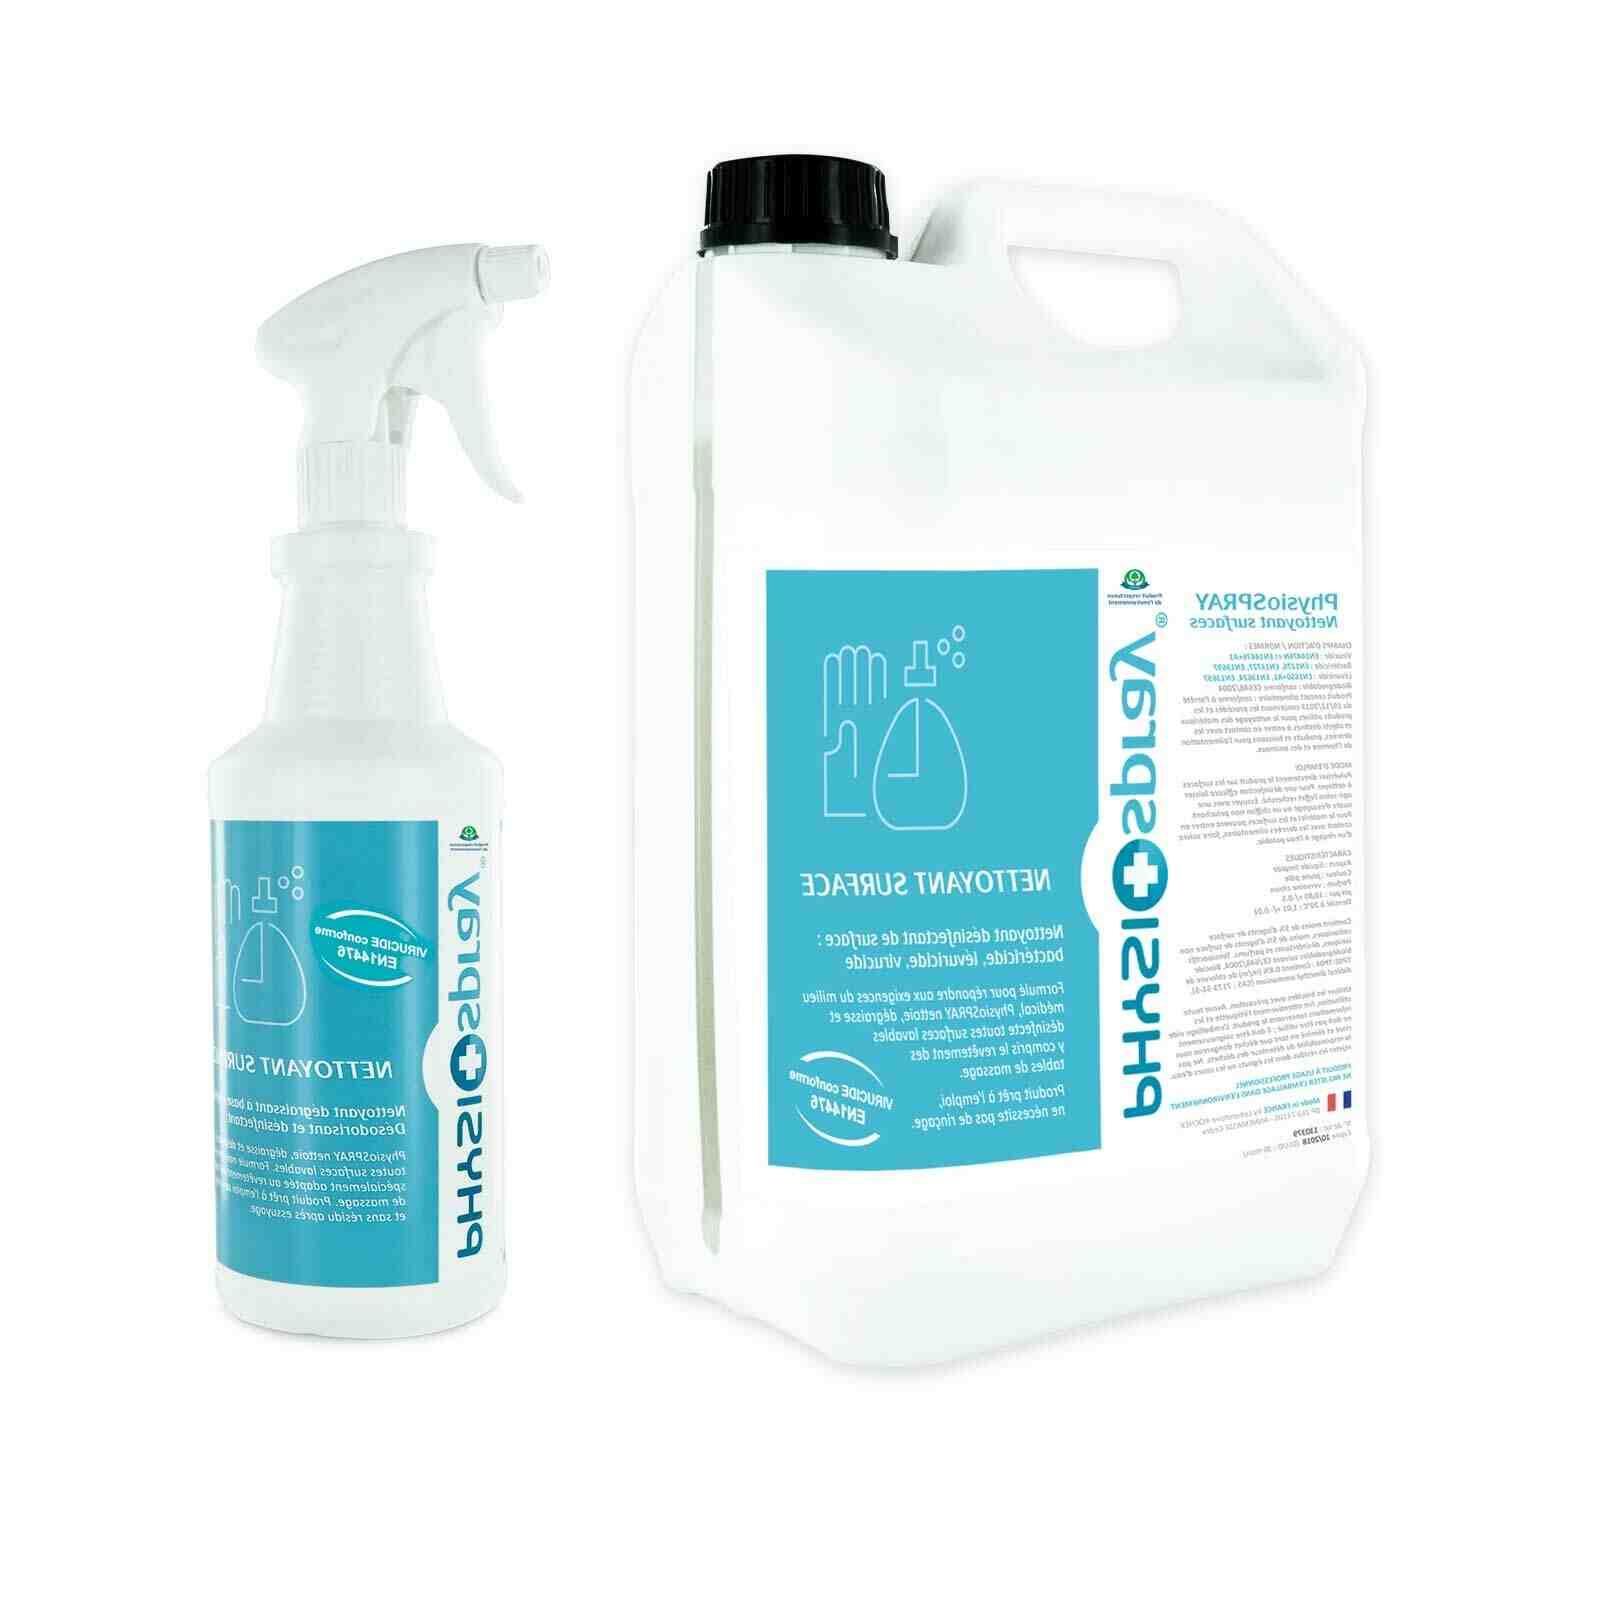 Comment utiliser le spray Sanytol ?